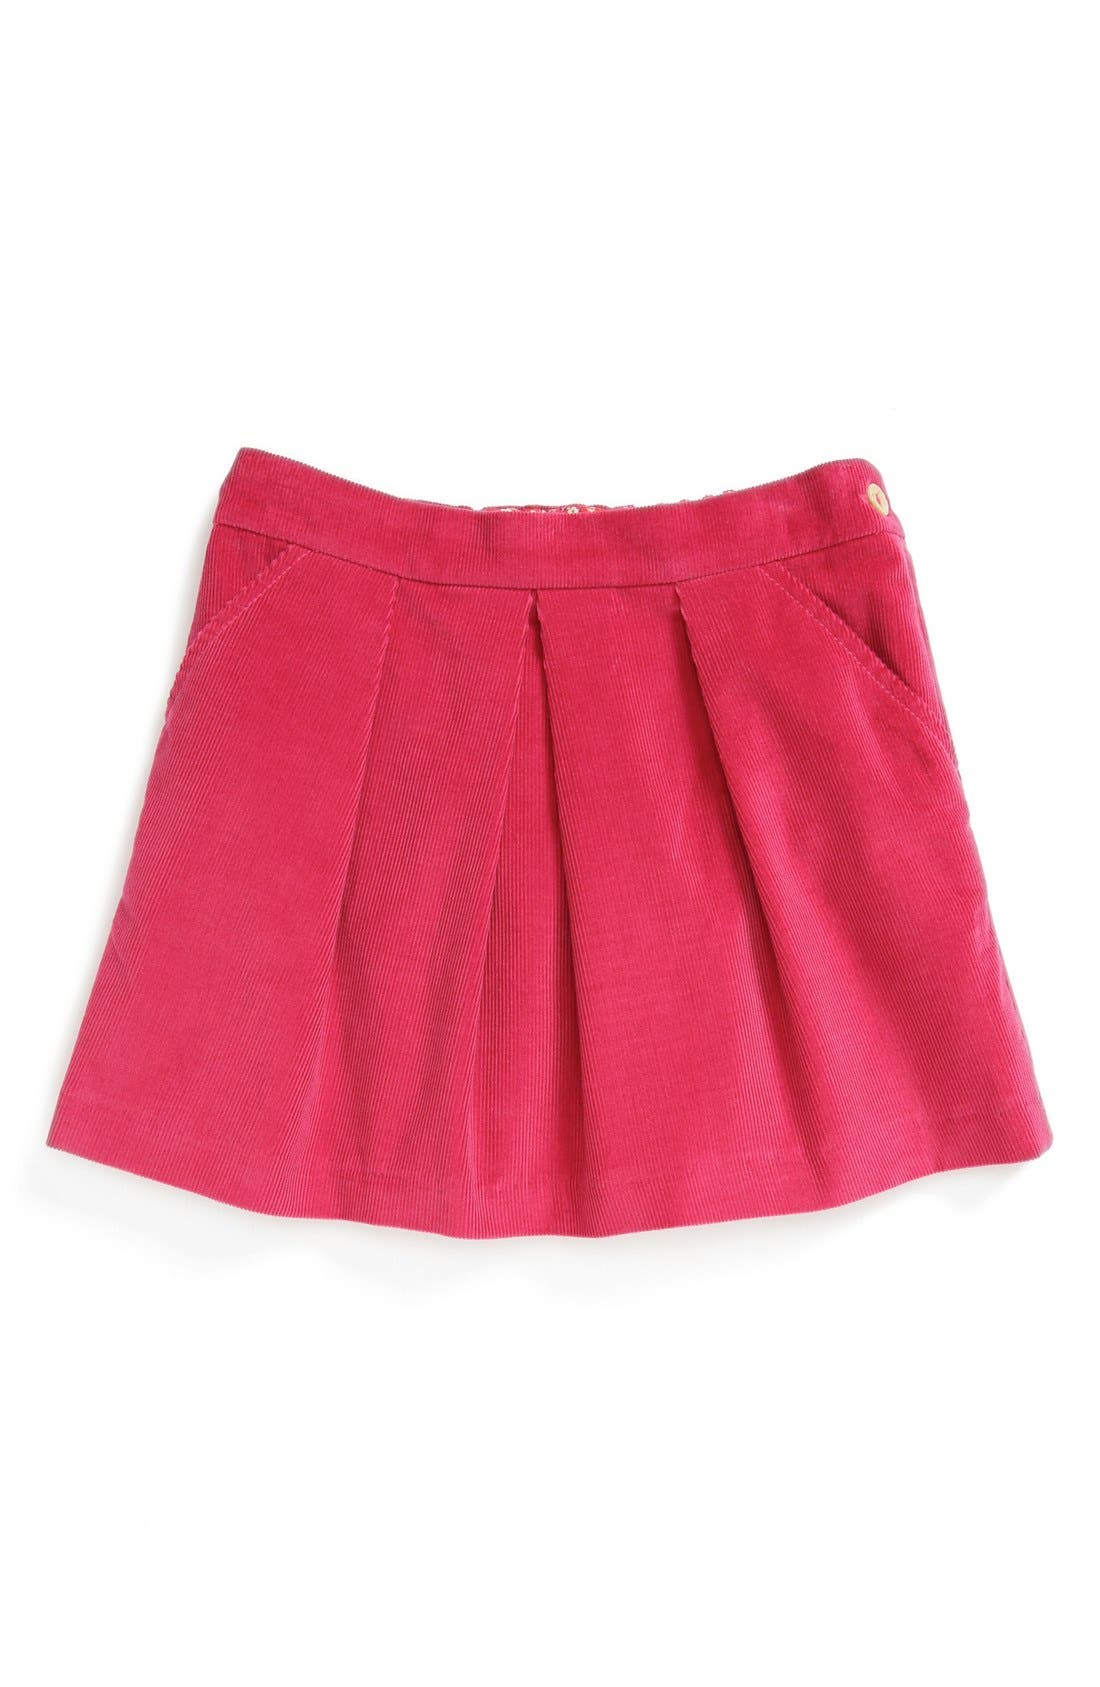 Alternate Image 1 Selected - Oscar de la Renta Corduroy Miniskirt (Little Girls & Big Girls)